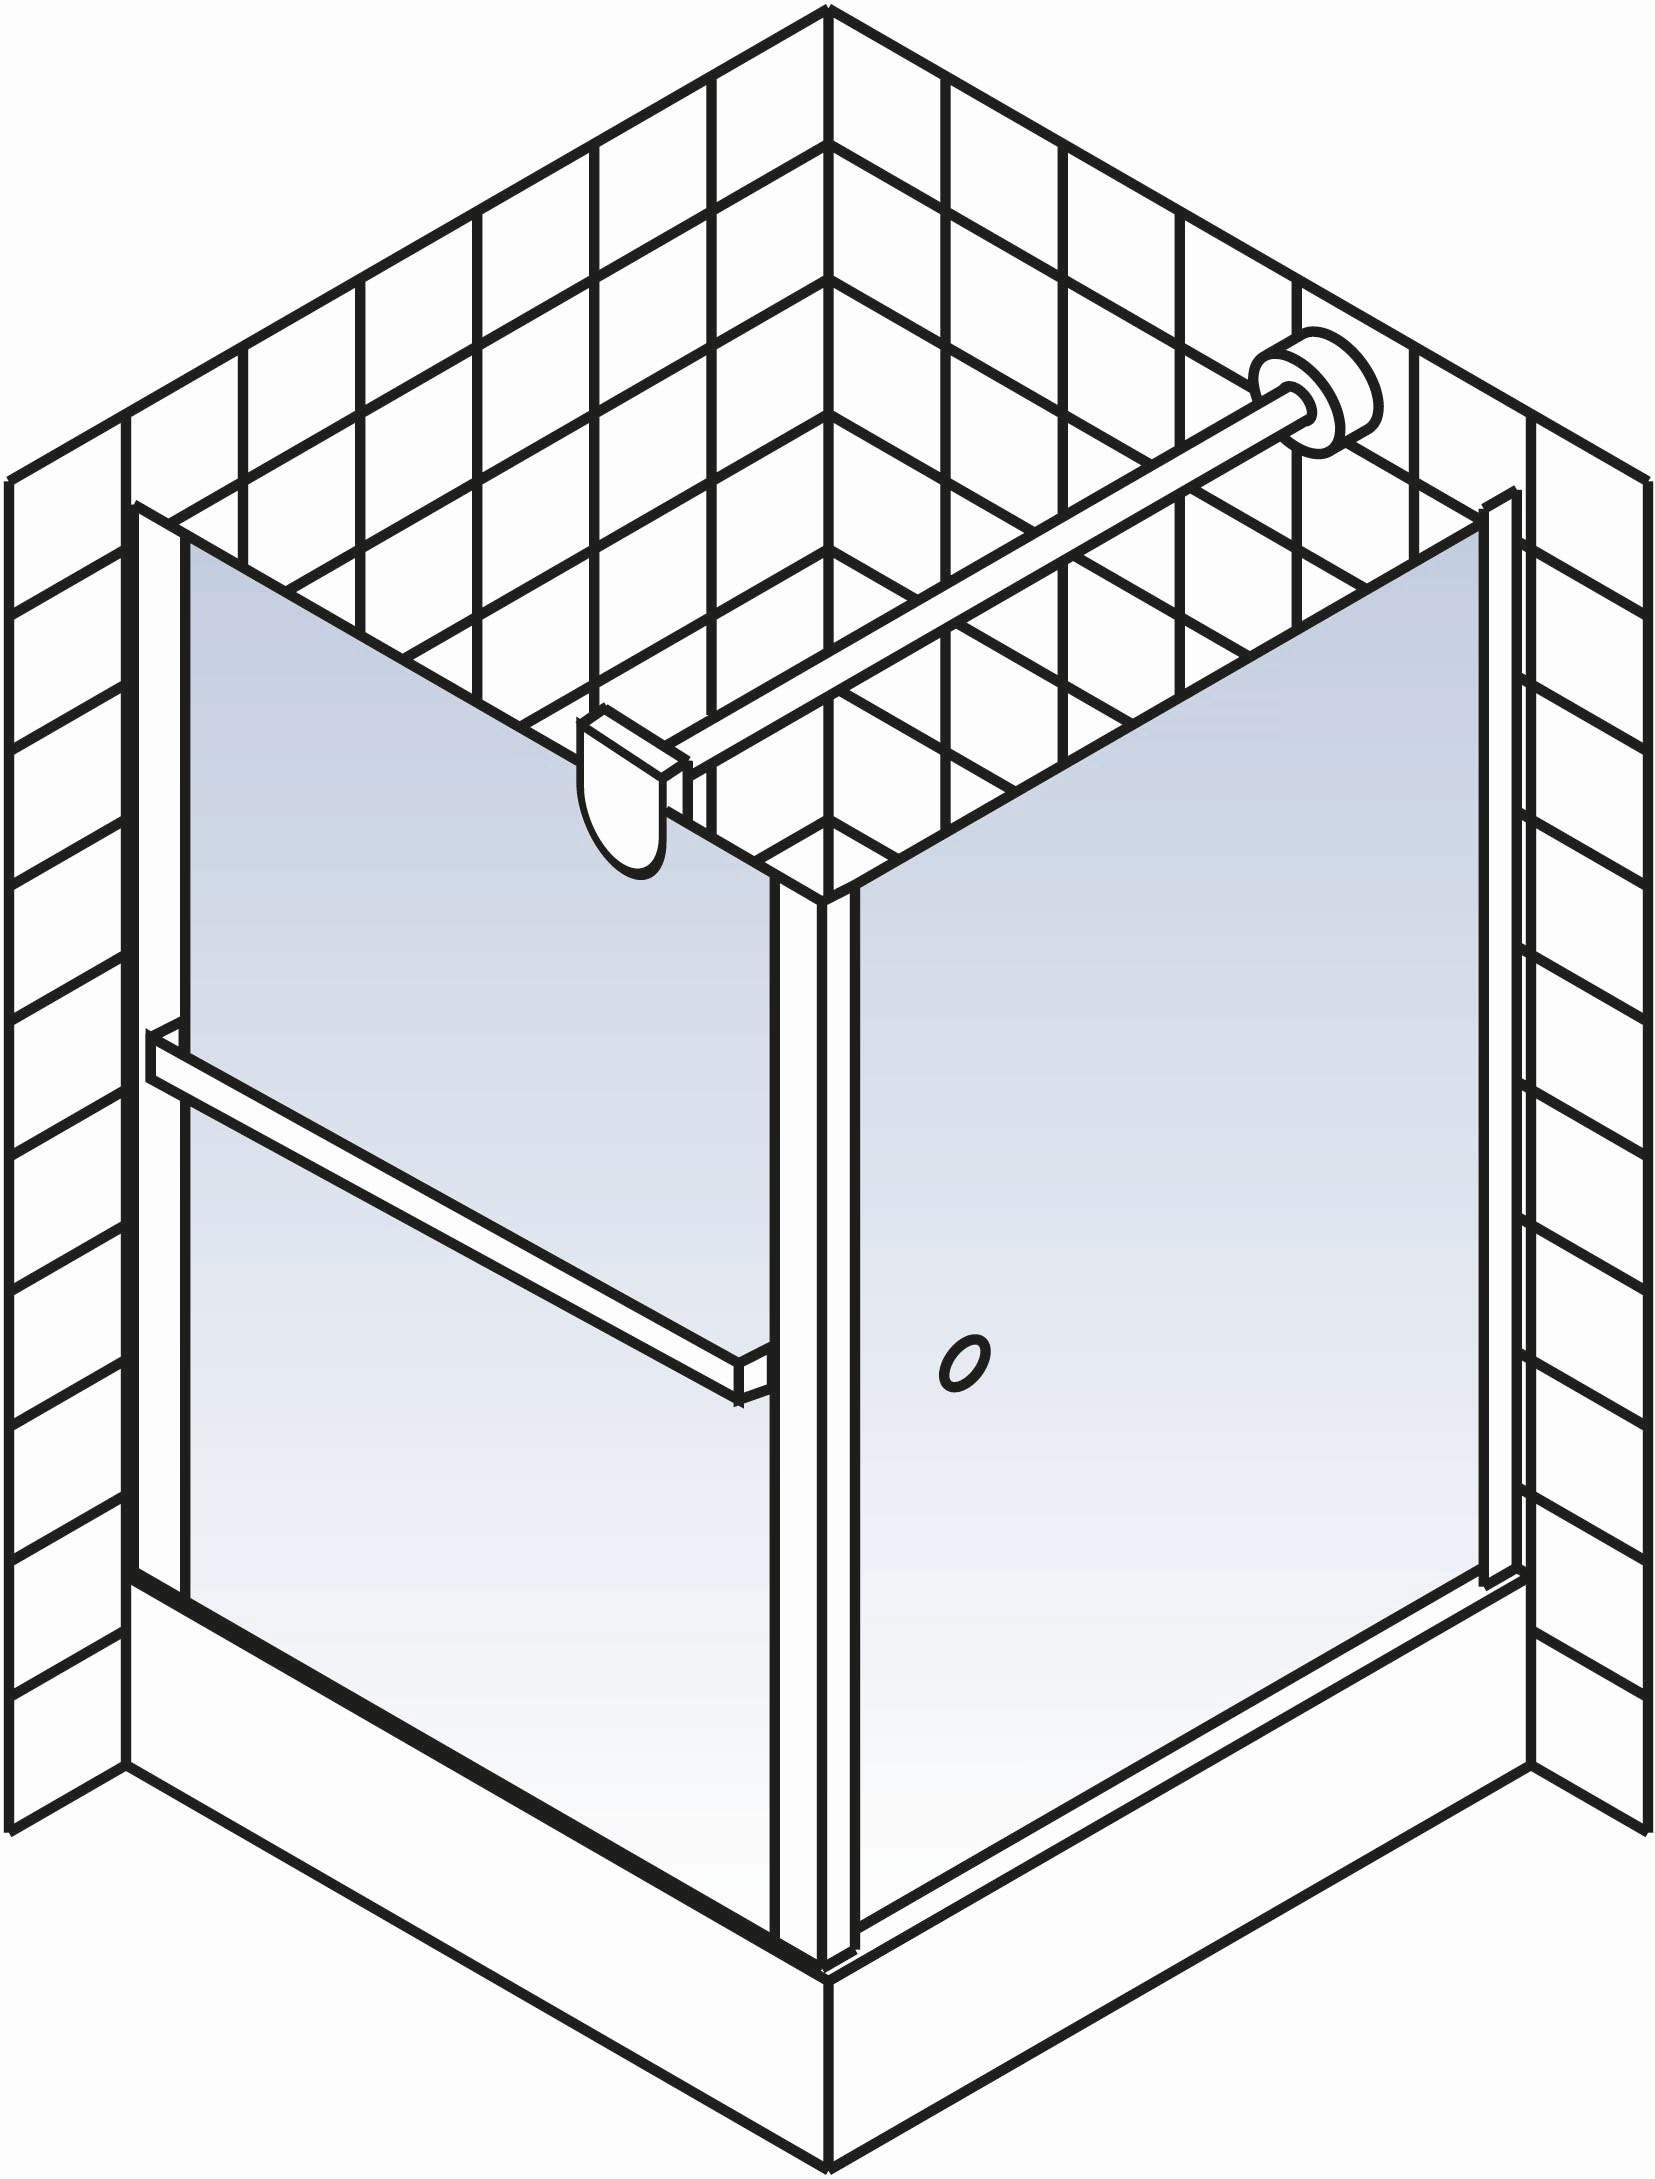 schulte garant dreht r porta mit seitenwand inkl handtuchhalter echtglas d8020x d8150x. Black Bedroom Furniture Sets. Home Design Ideas